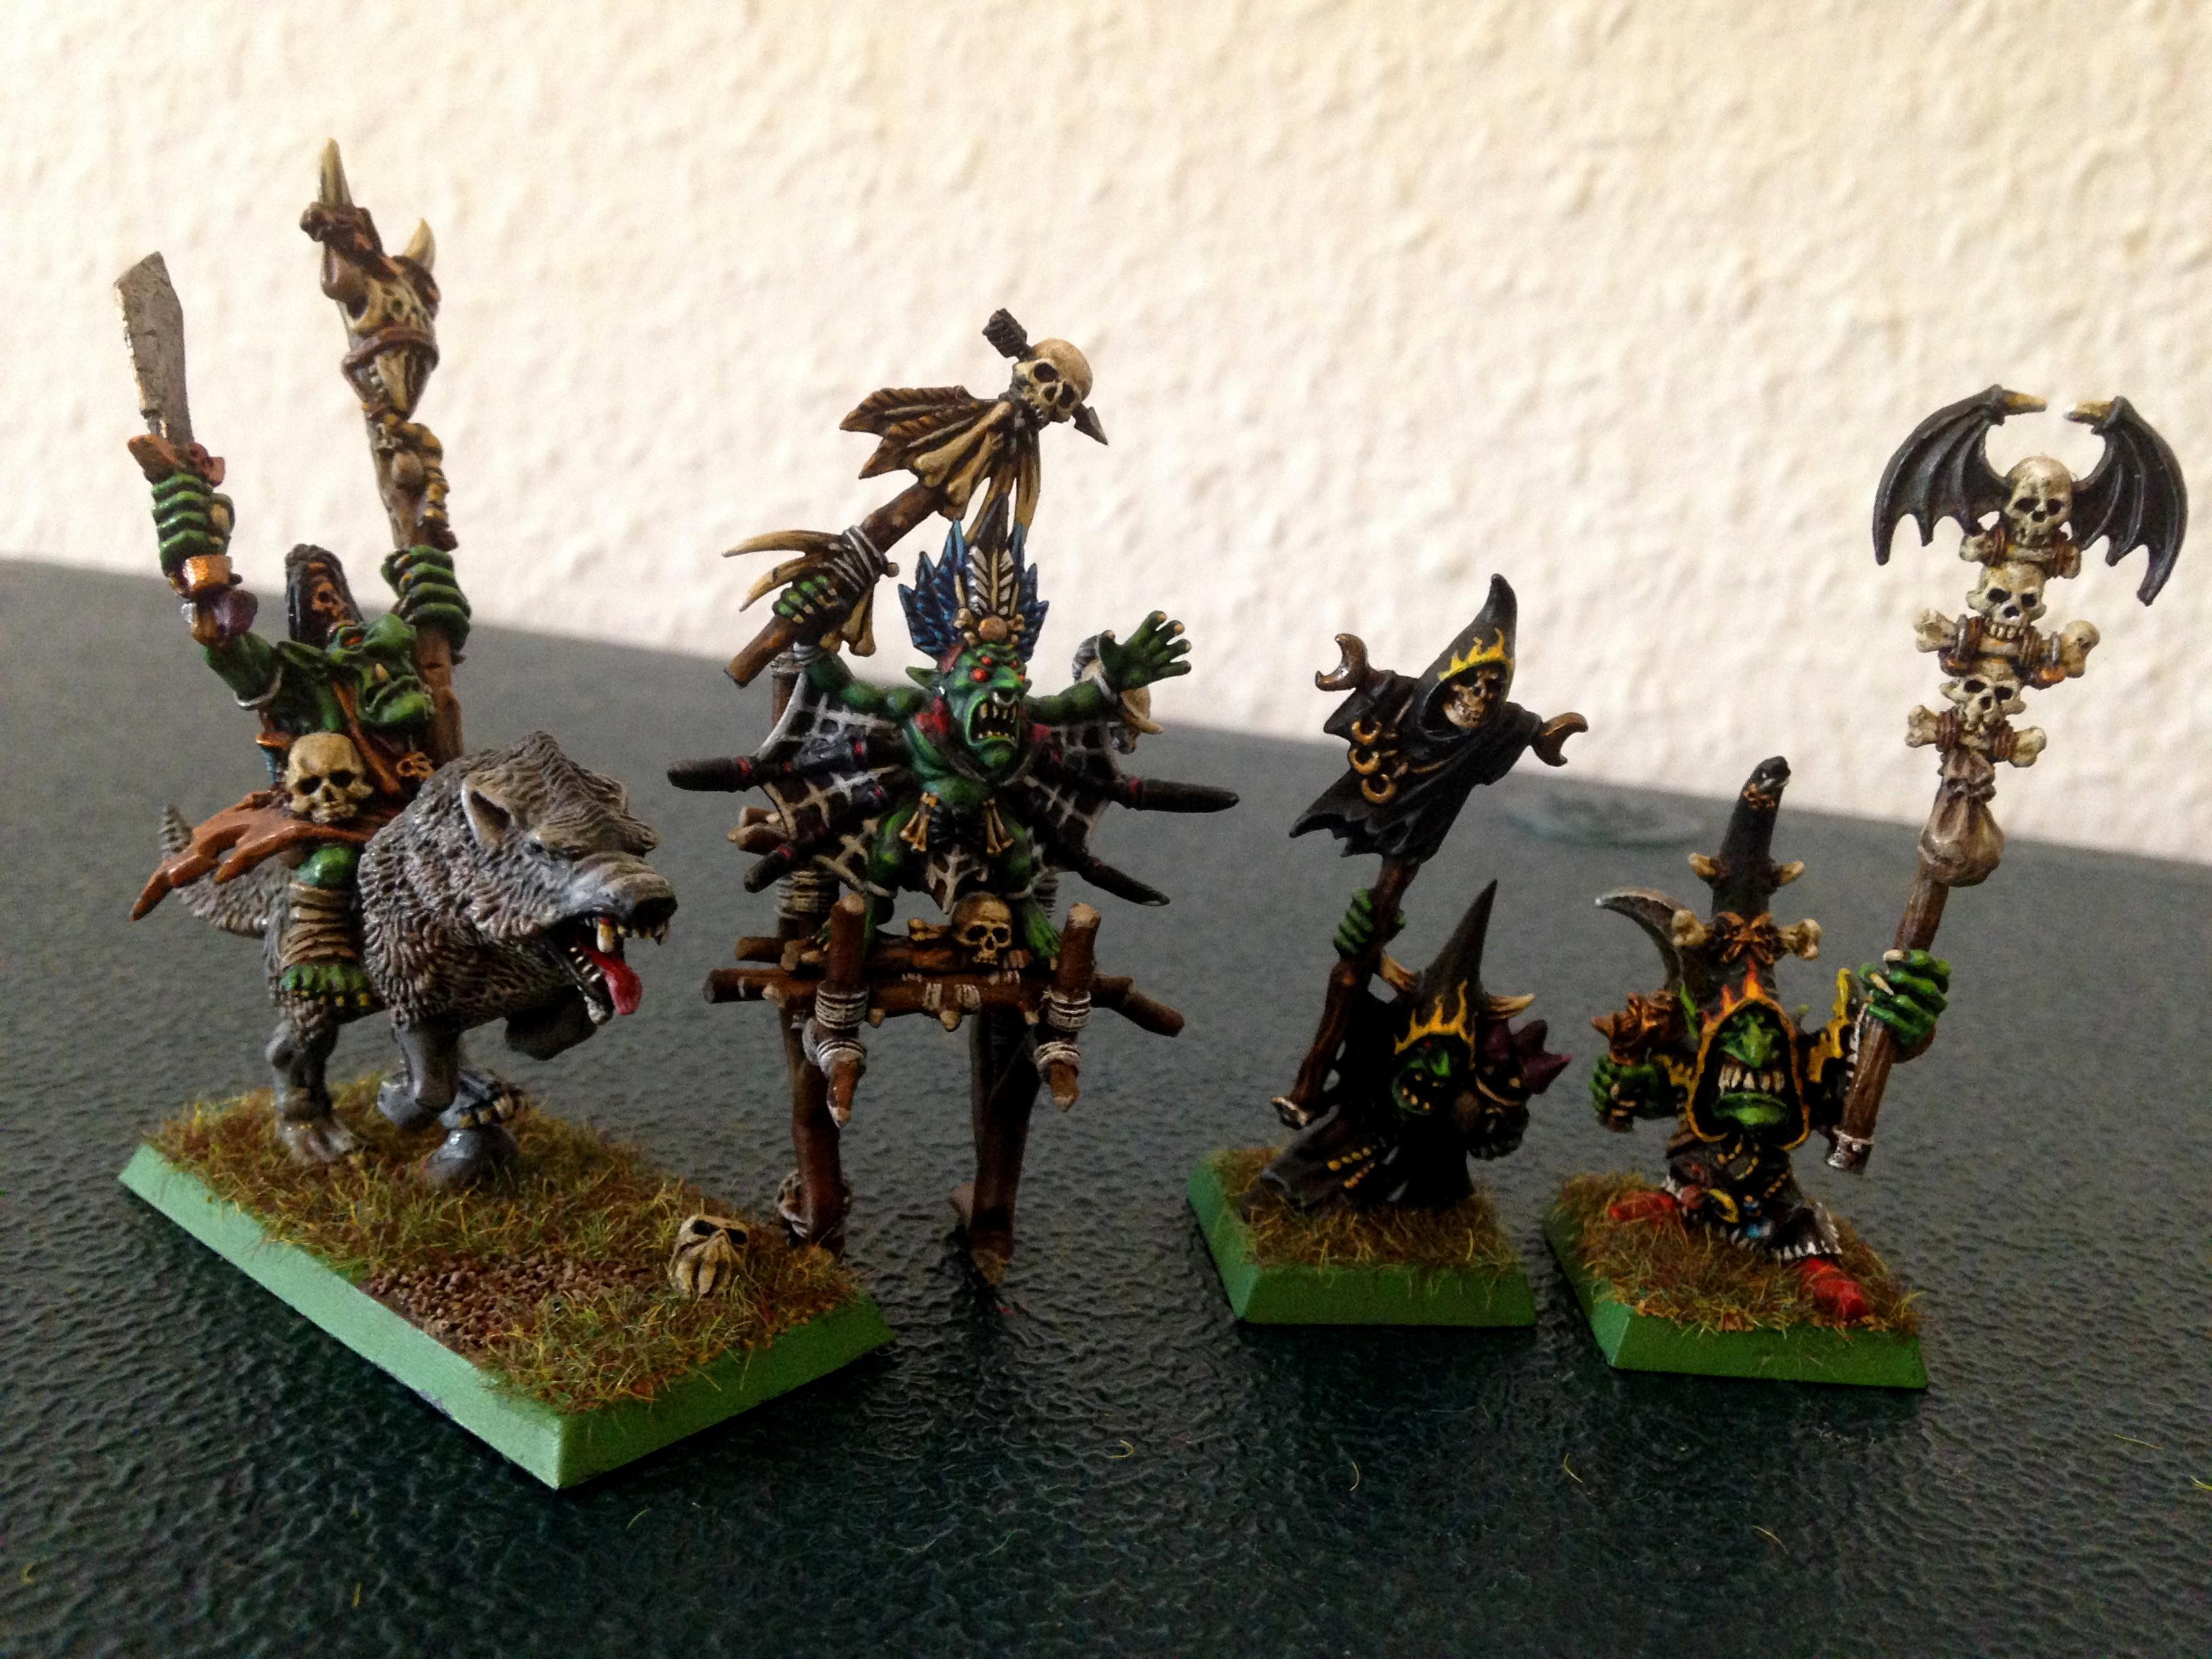 Goblin Shaman, Night Goblin Shaman, Orcs, Orcs And Goblins, Shaman, Warhammer Fantasy